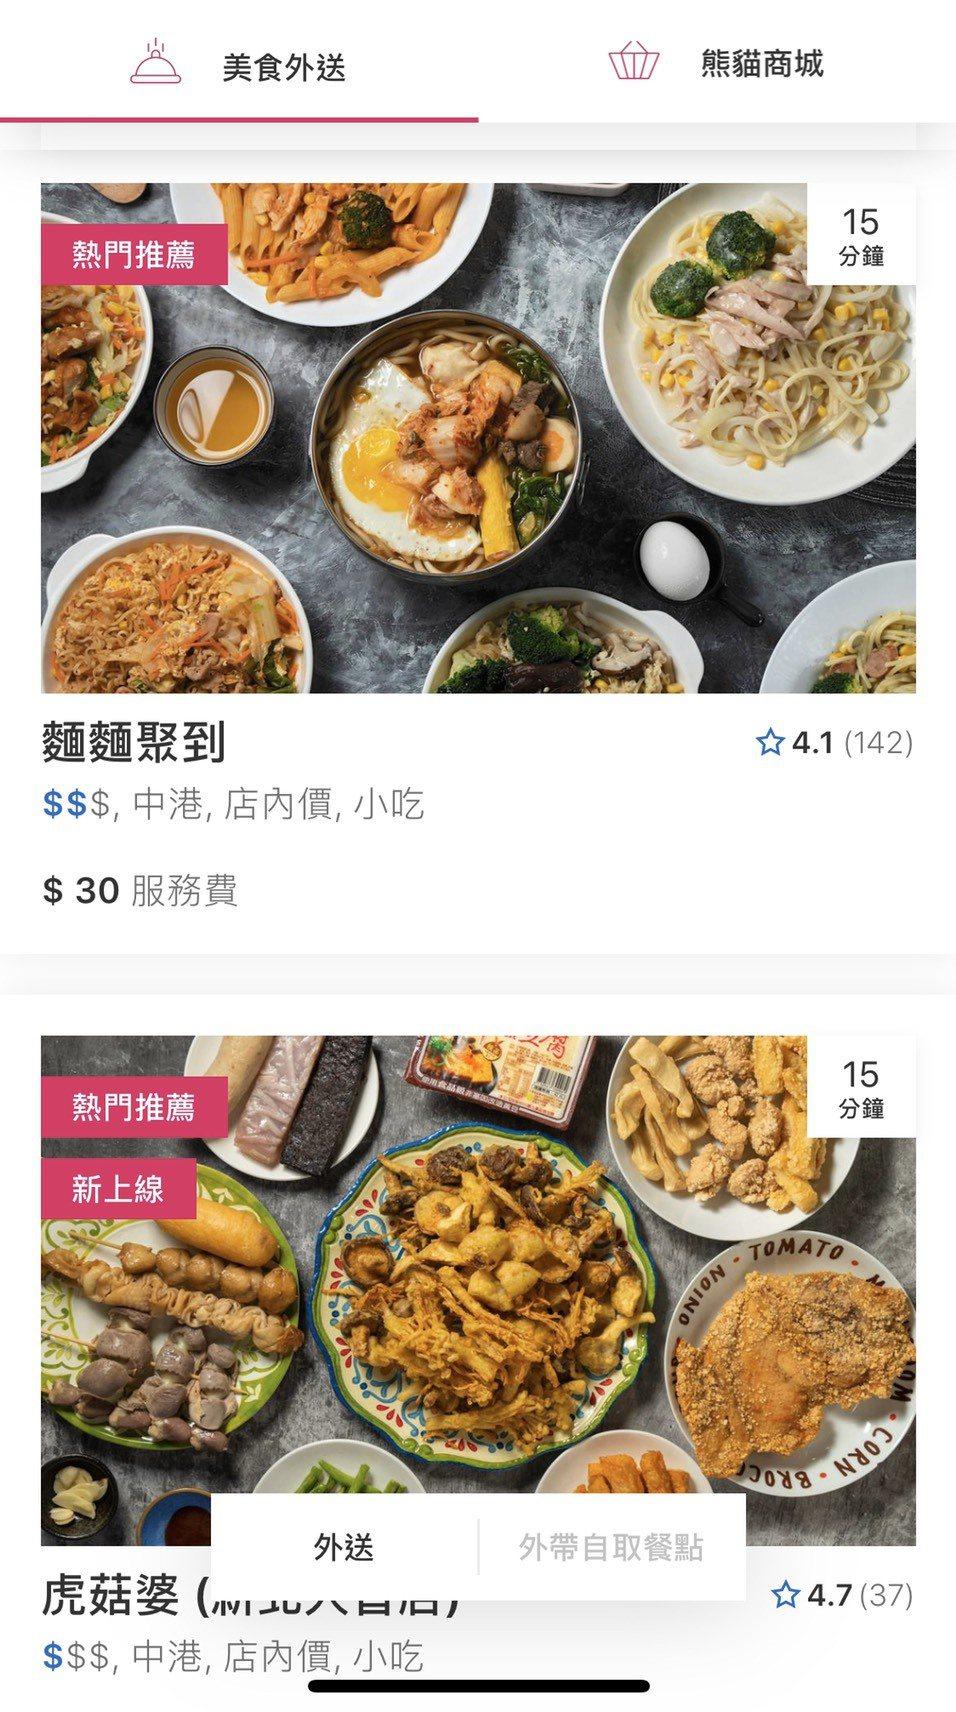 foodpanda 餐點美照讓網友驚呼根本專業級攝影。圖/翻攝自foodpand...